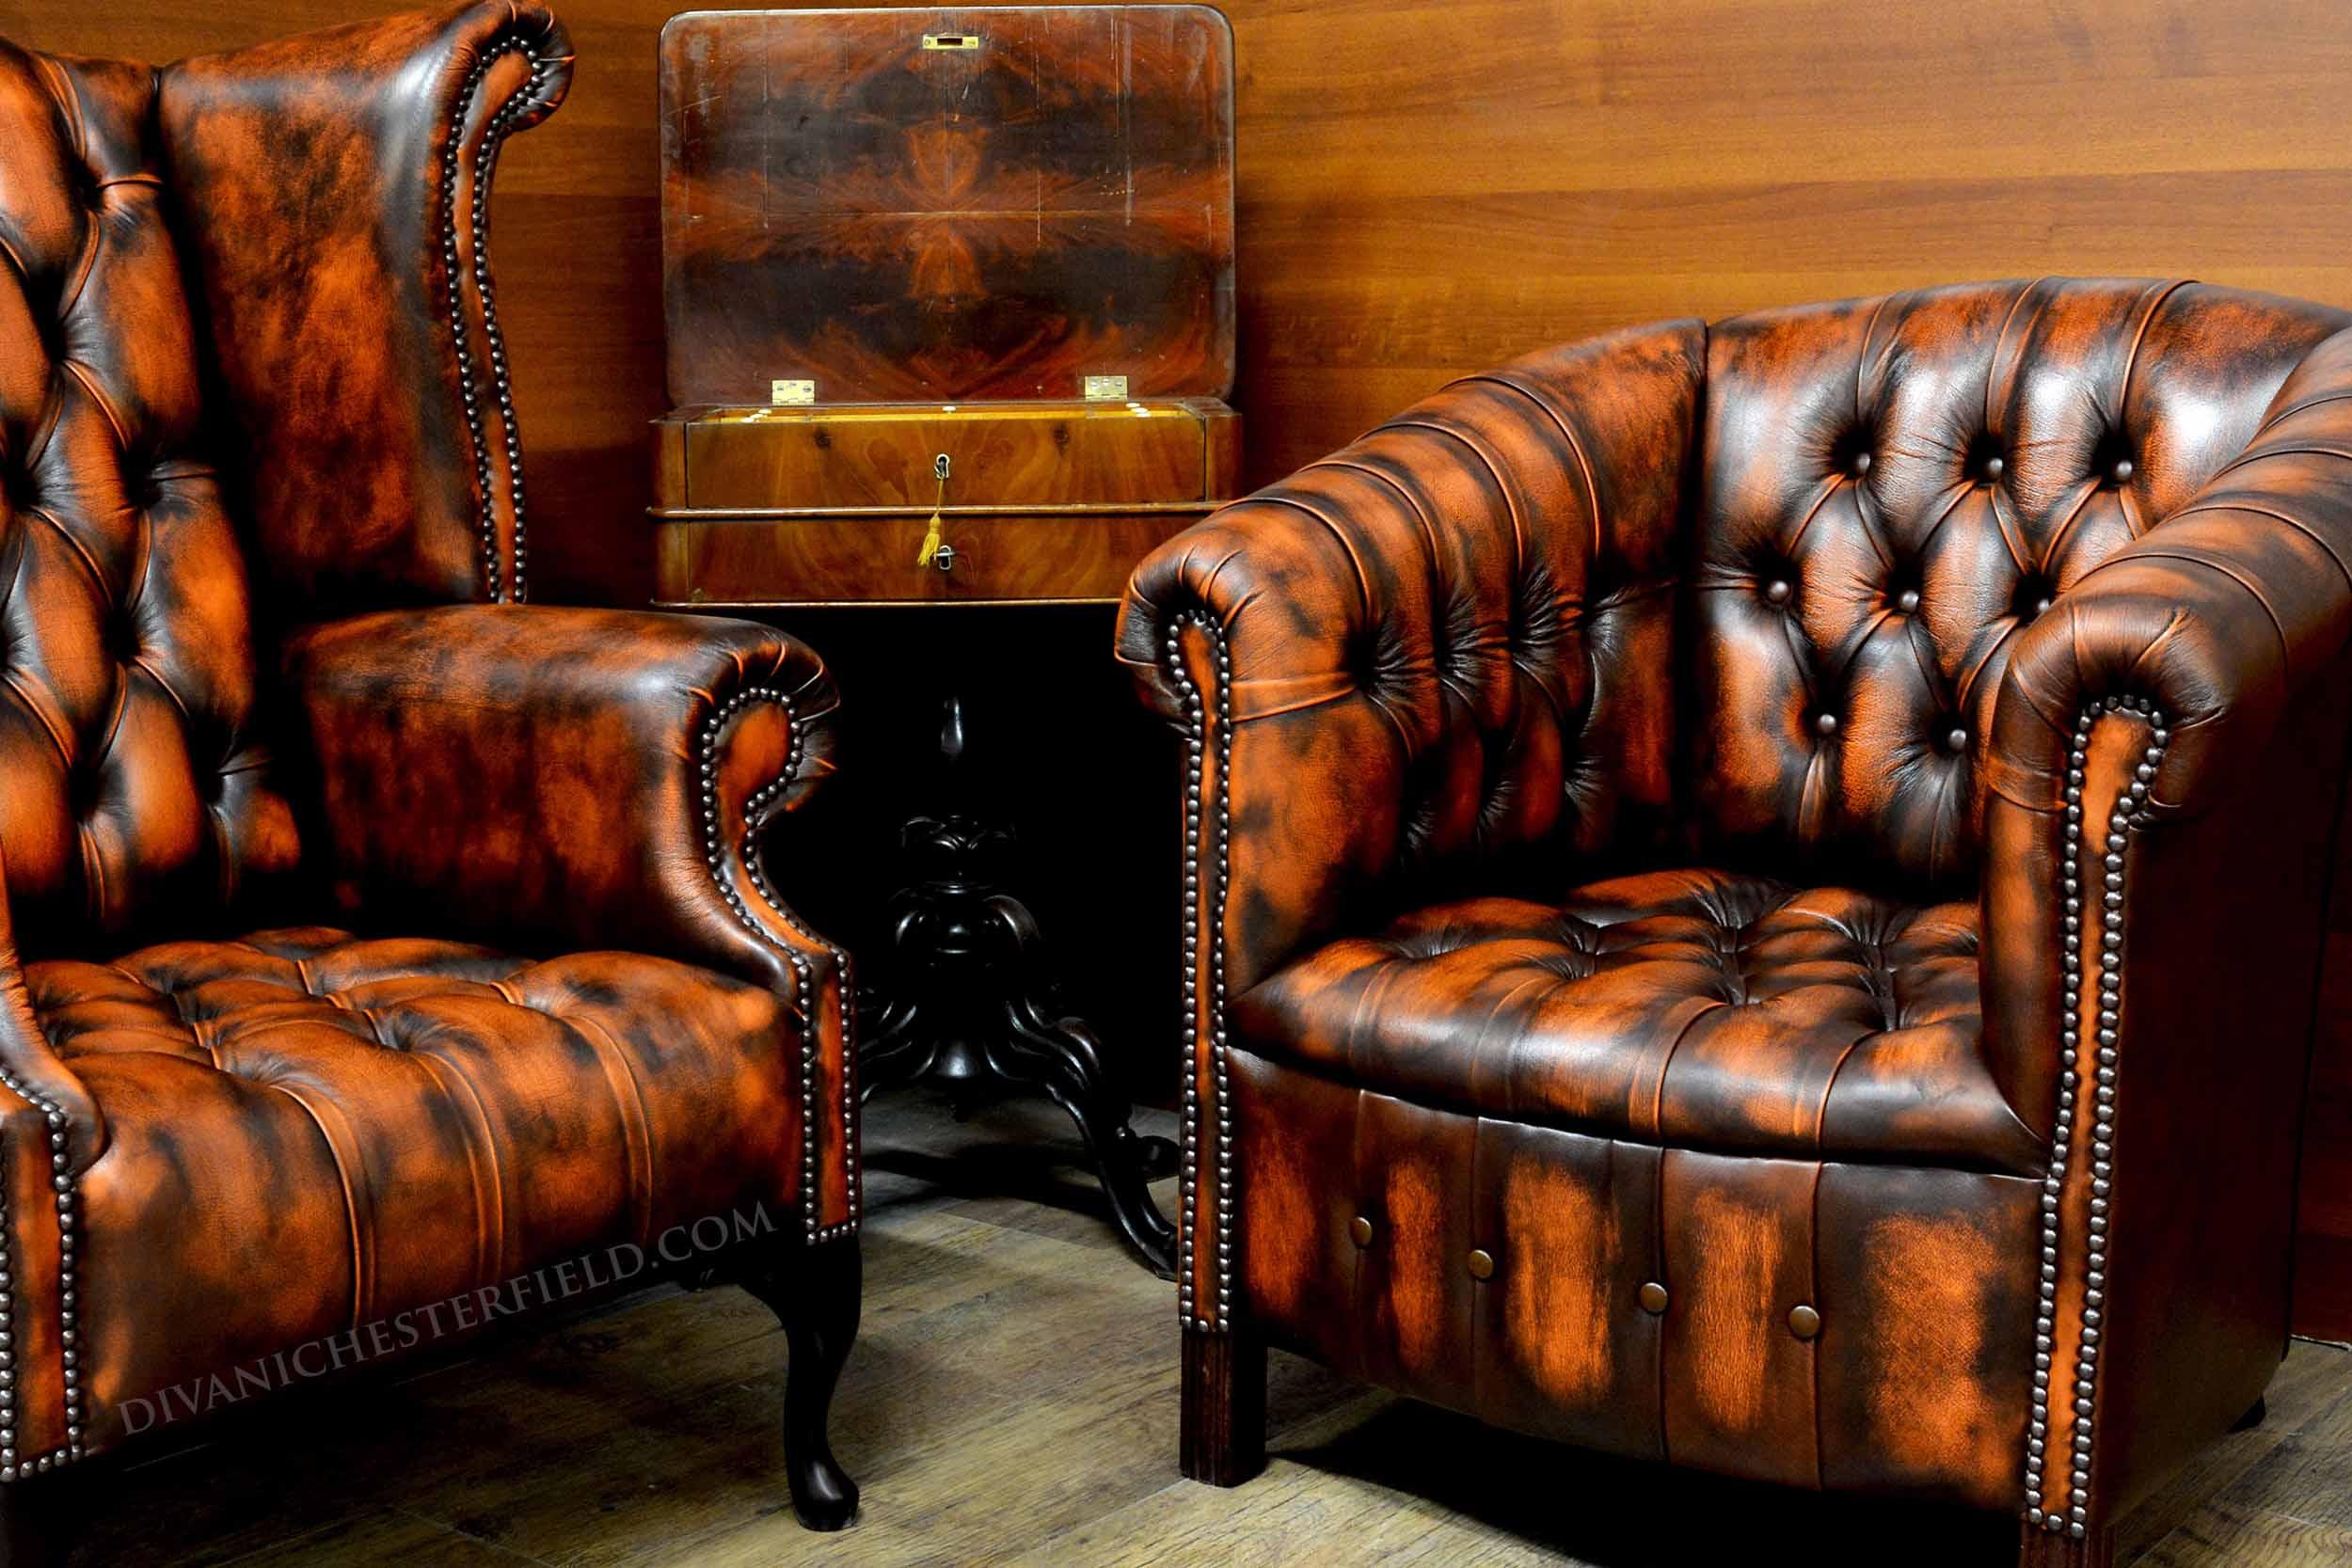 Poltrona chesterfield vintage pelle arancione nuova - Poltrone in pelle chesterfield ...